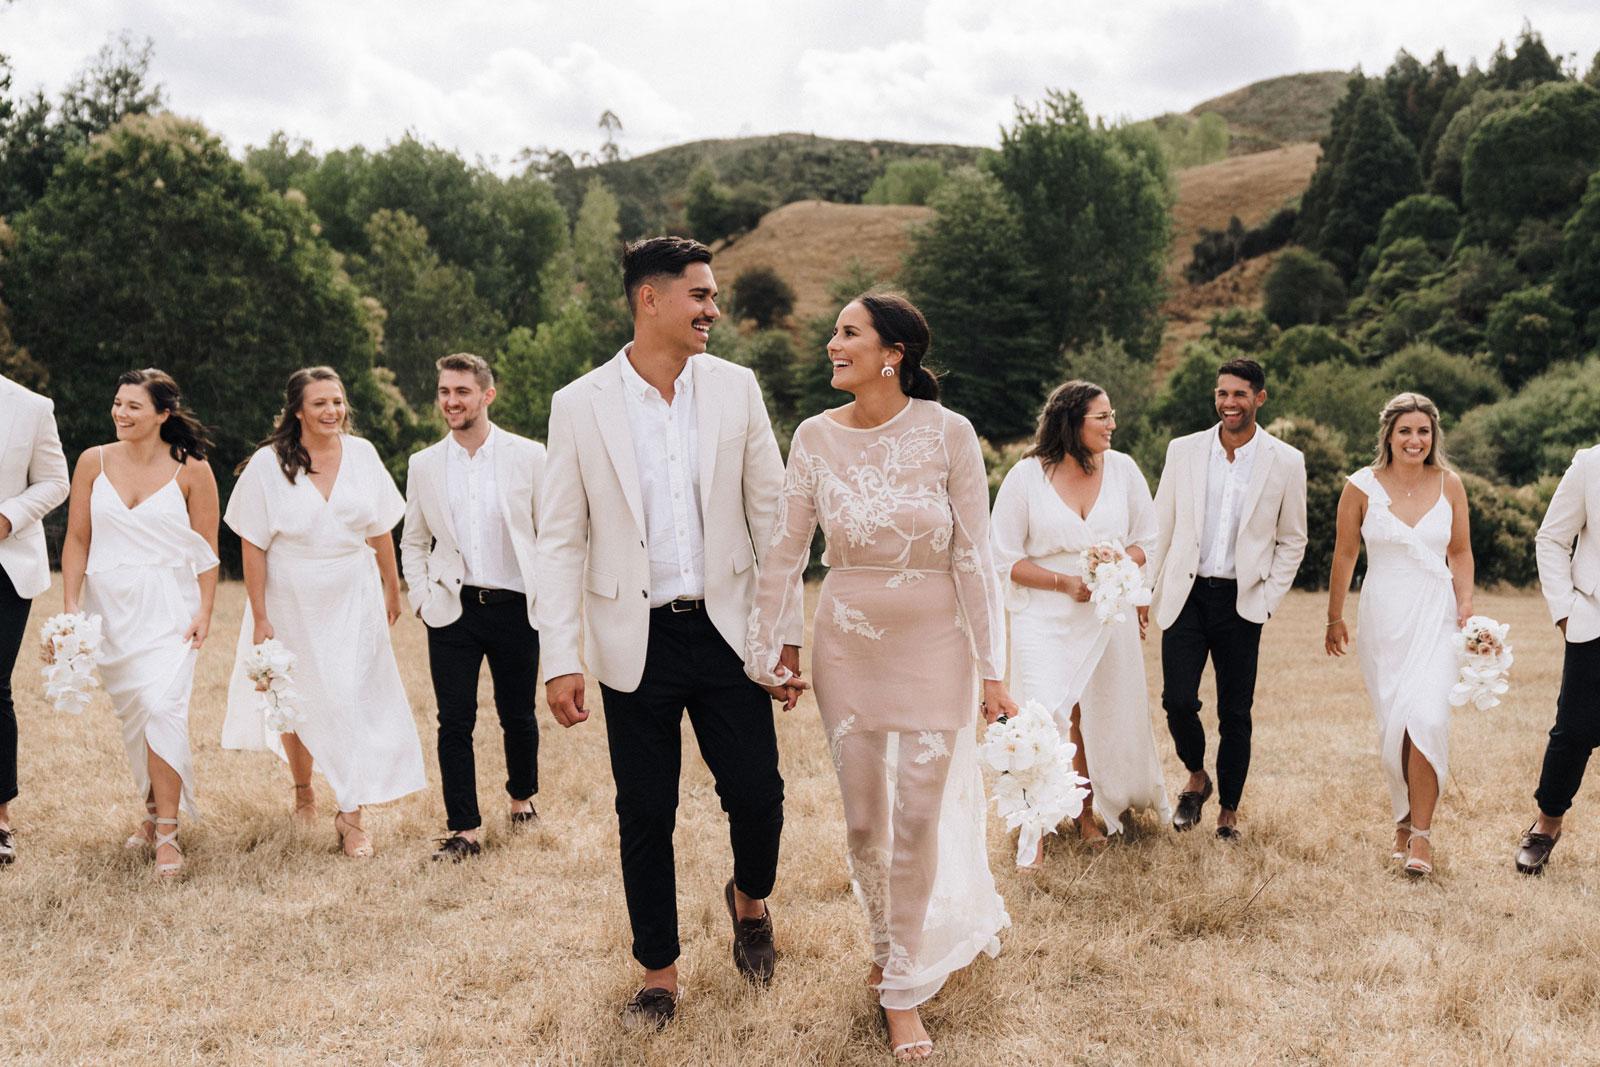 newfound-s-t-hunua-auckland-wedding-photographers-054